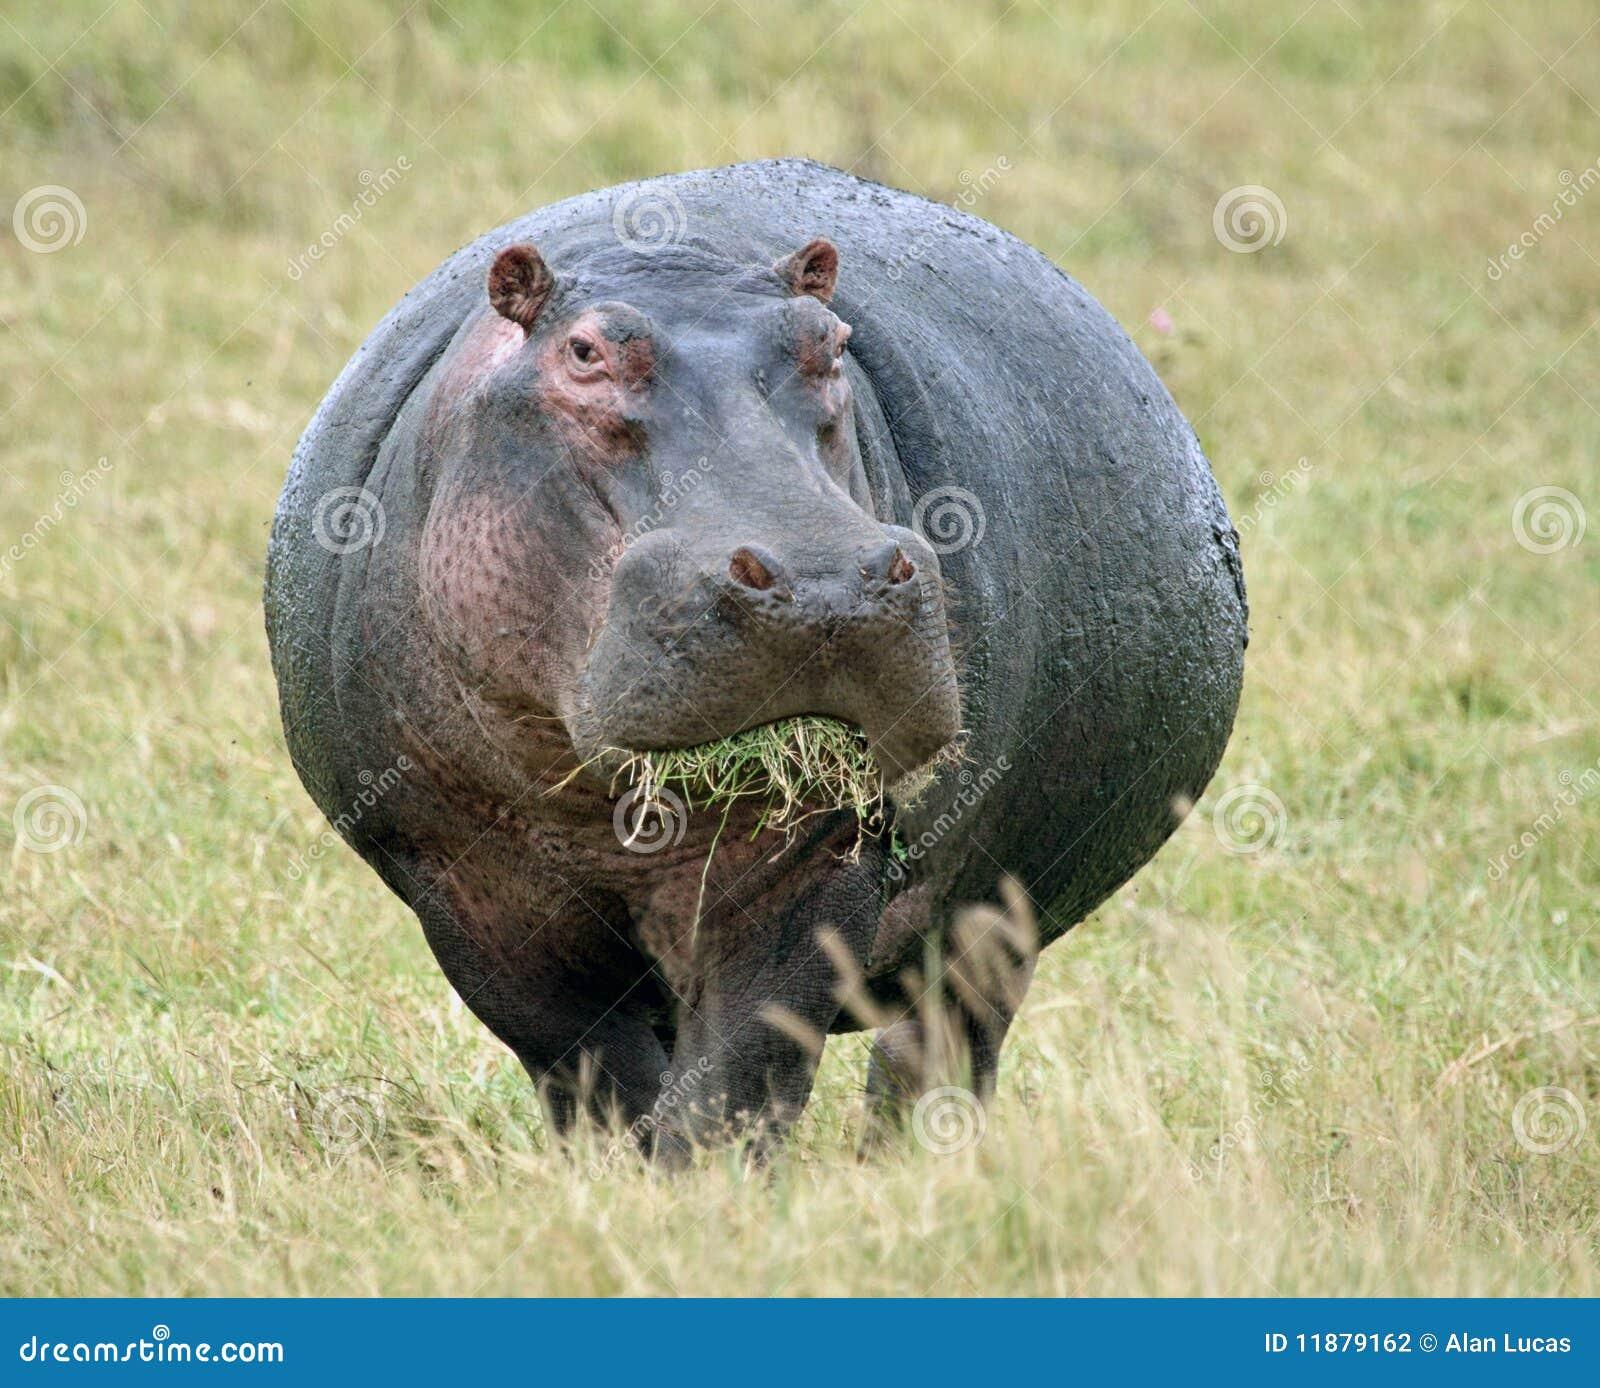 Hippopotamus Eating Grass Stock Photography - Image: 11879162